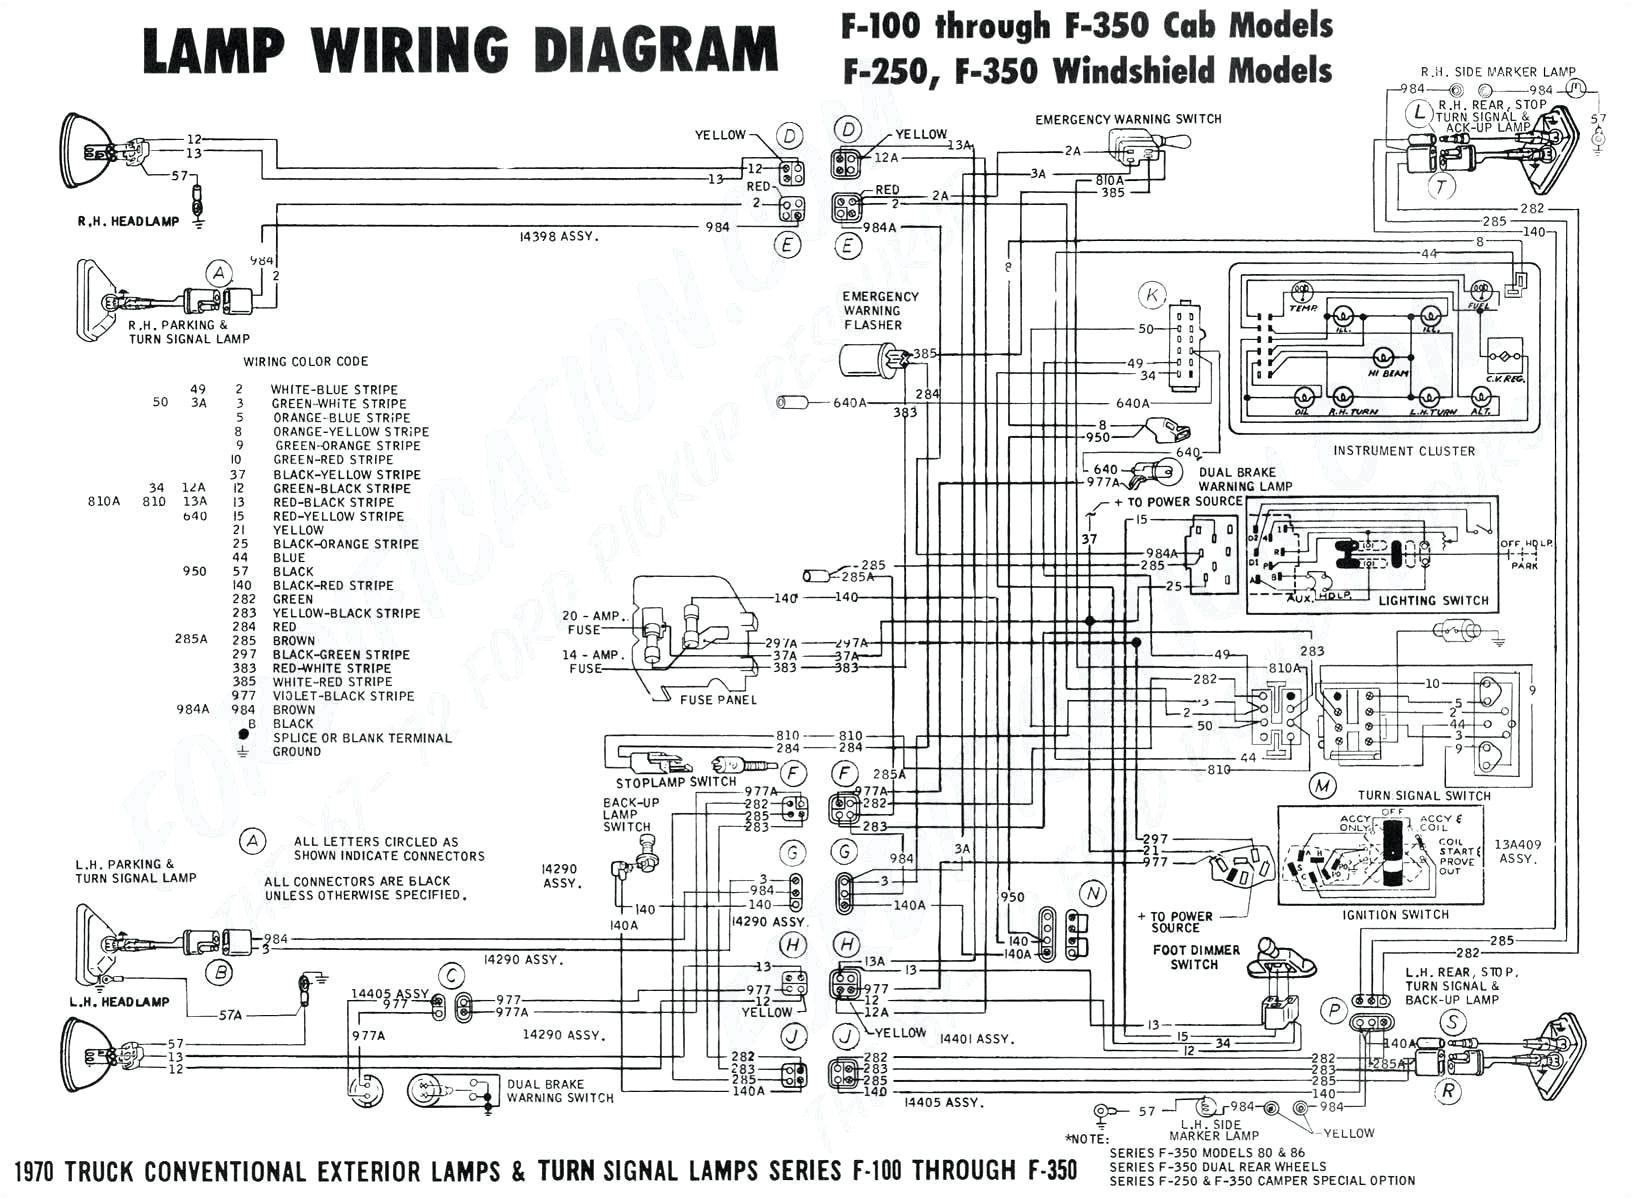 honeywell manual thermostat wiring diagram